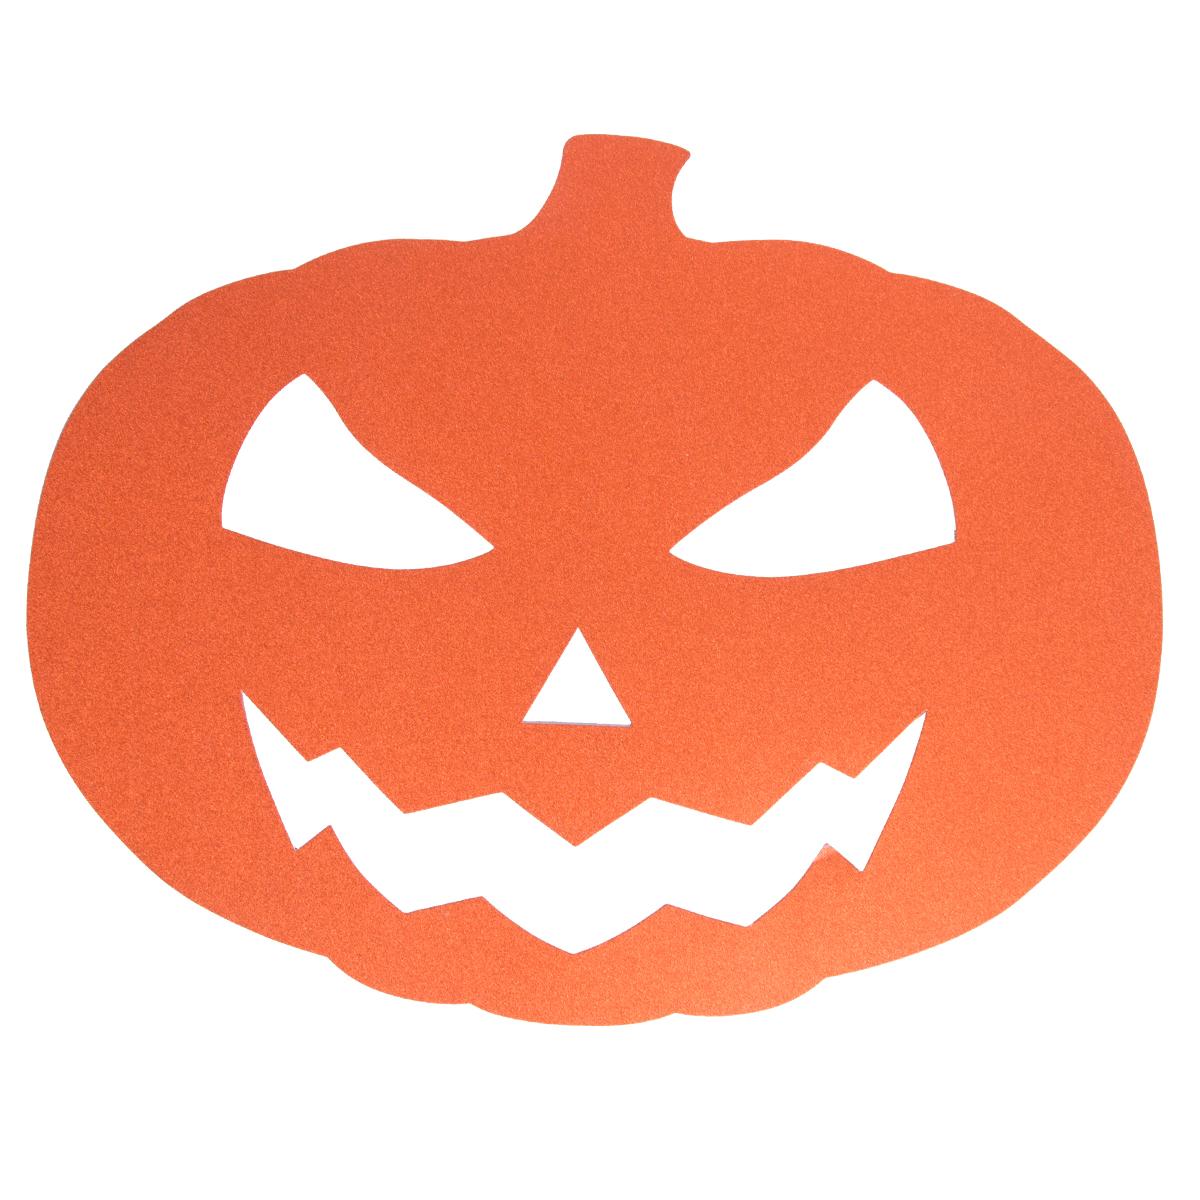 Halloweendekoration  1a09f33536a69